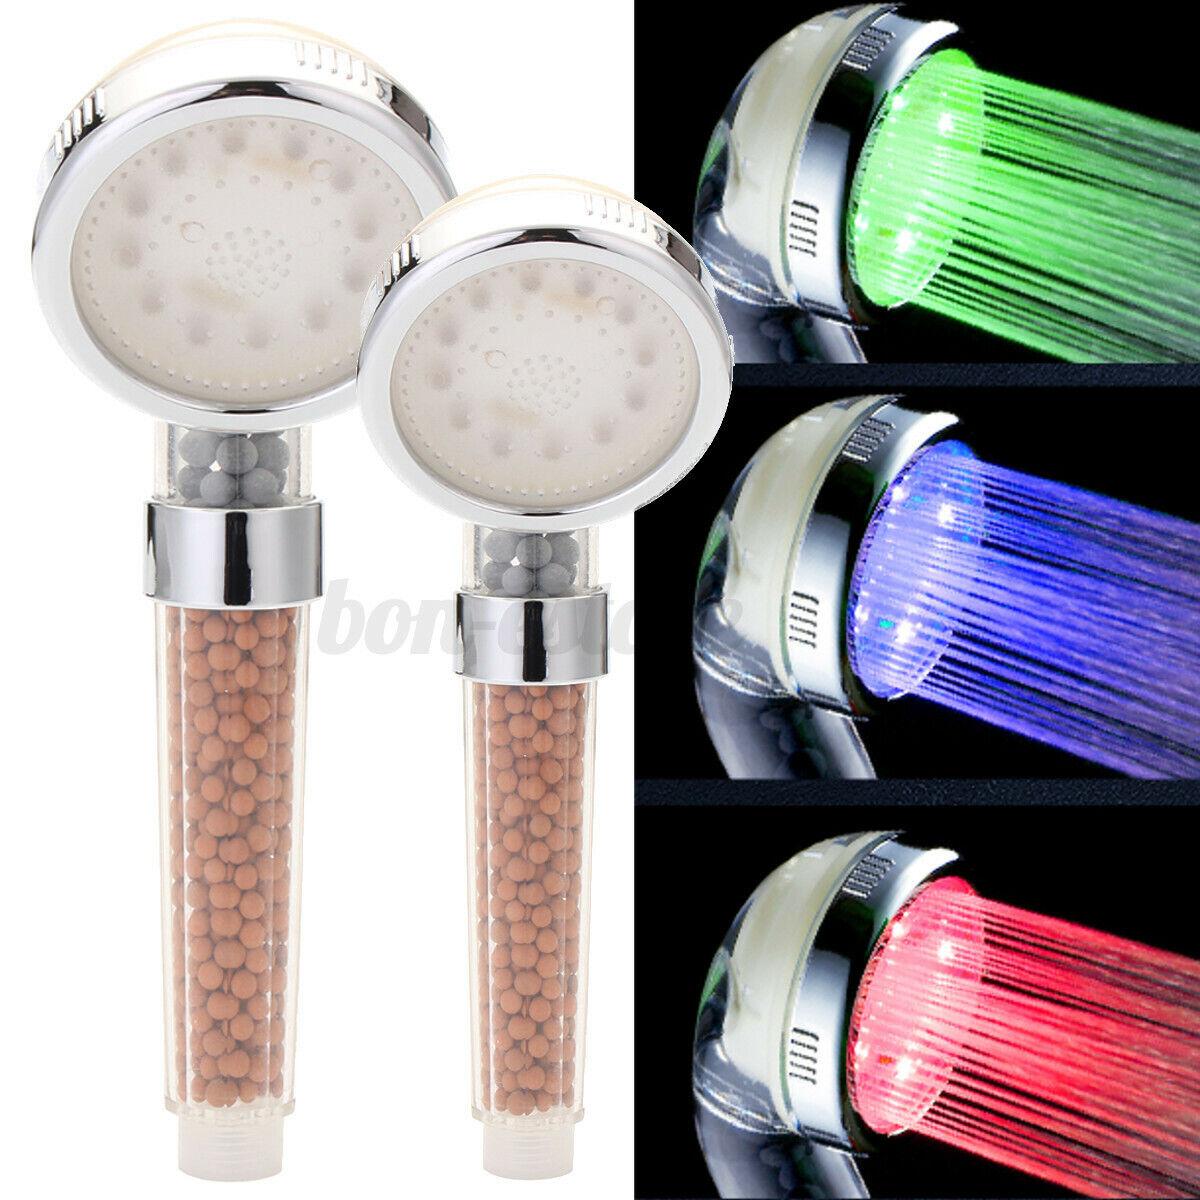 3 Color Chanin LED Liht Shower Head Handheld Ionic Filtration Showerhead  US! Bath